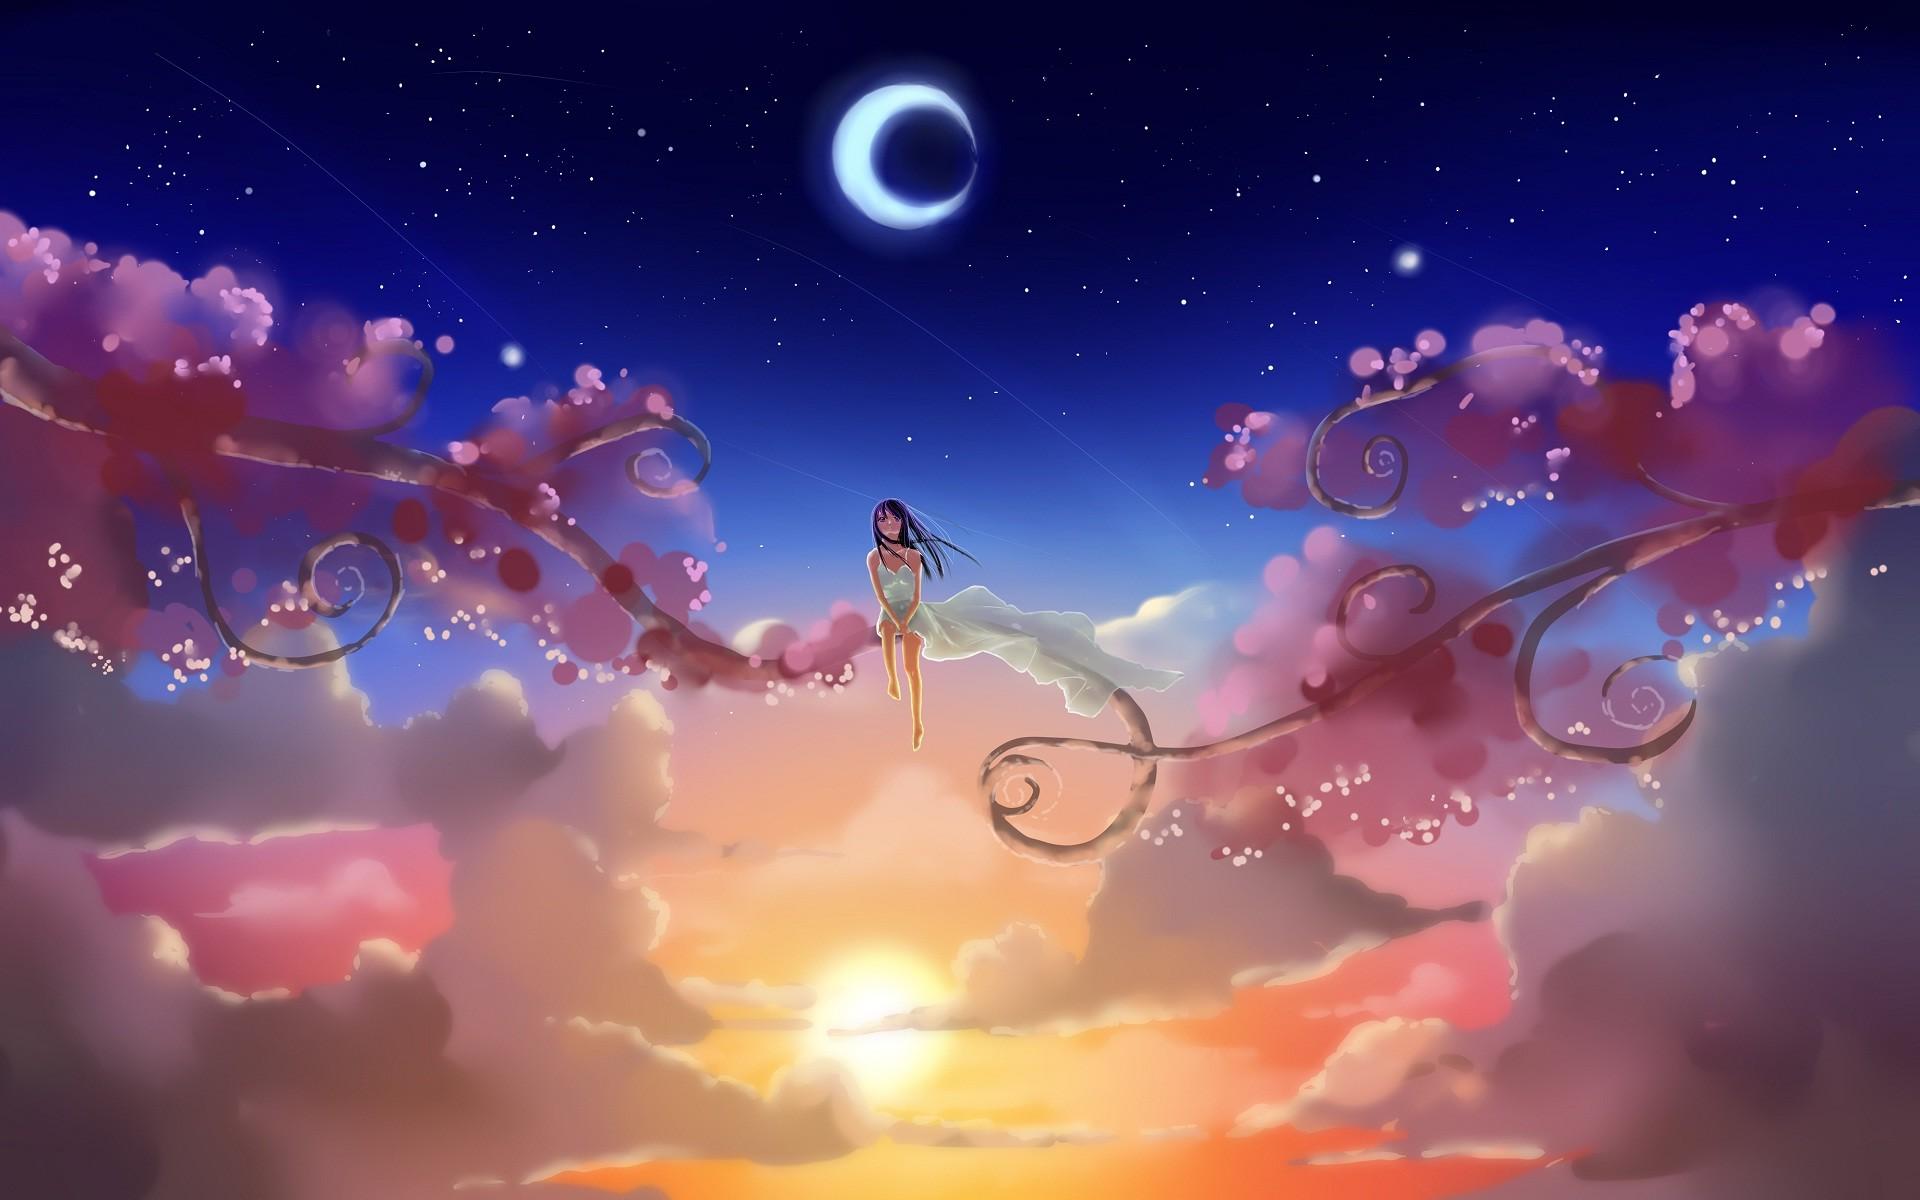 Nice Wallpaper For Laptop Imagenes De Fondo Anime 150933 Hd Wallpaper Backgrounds Download